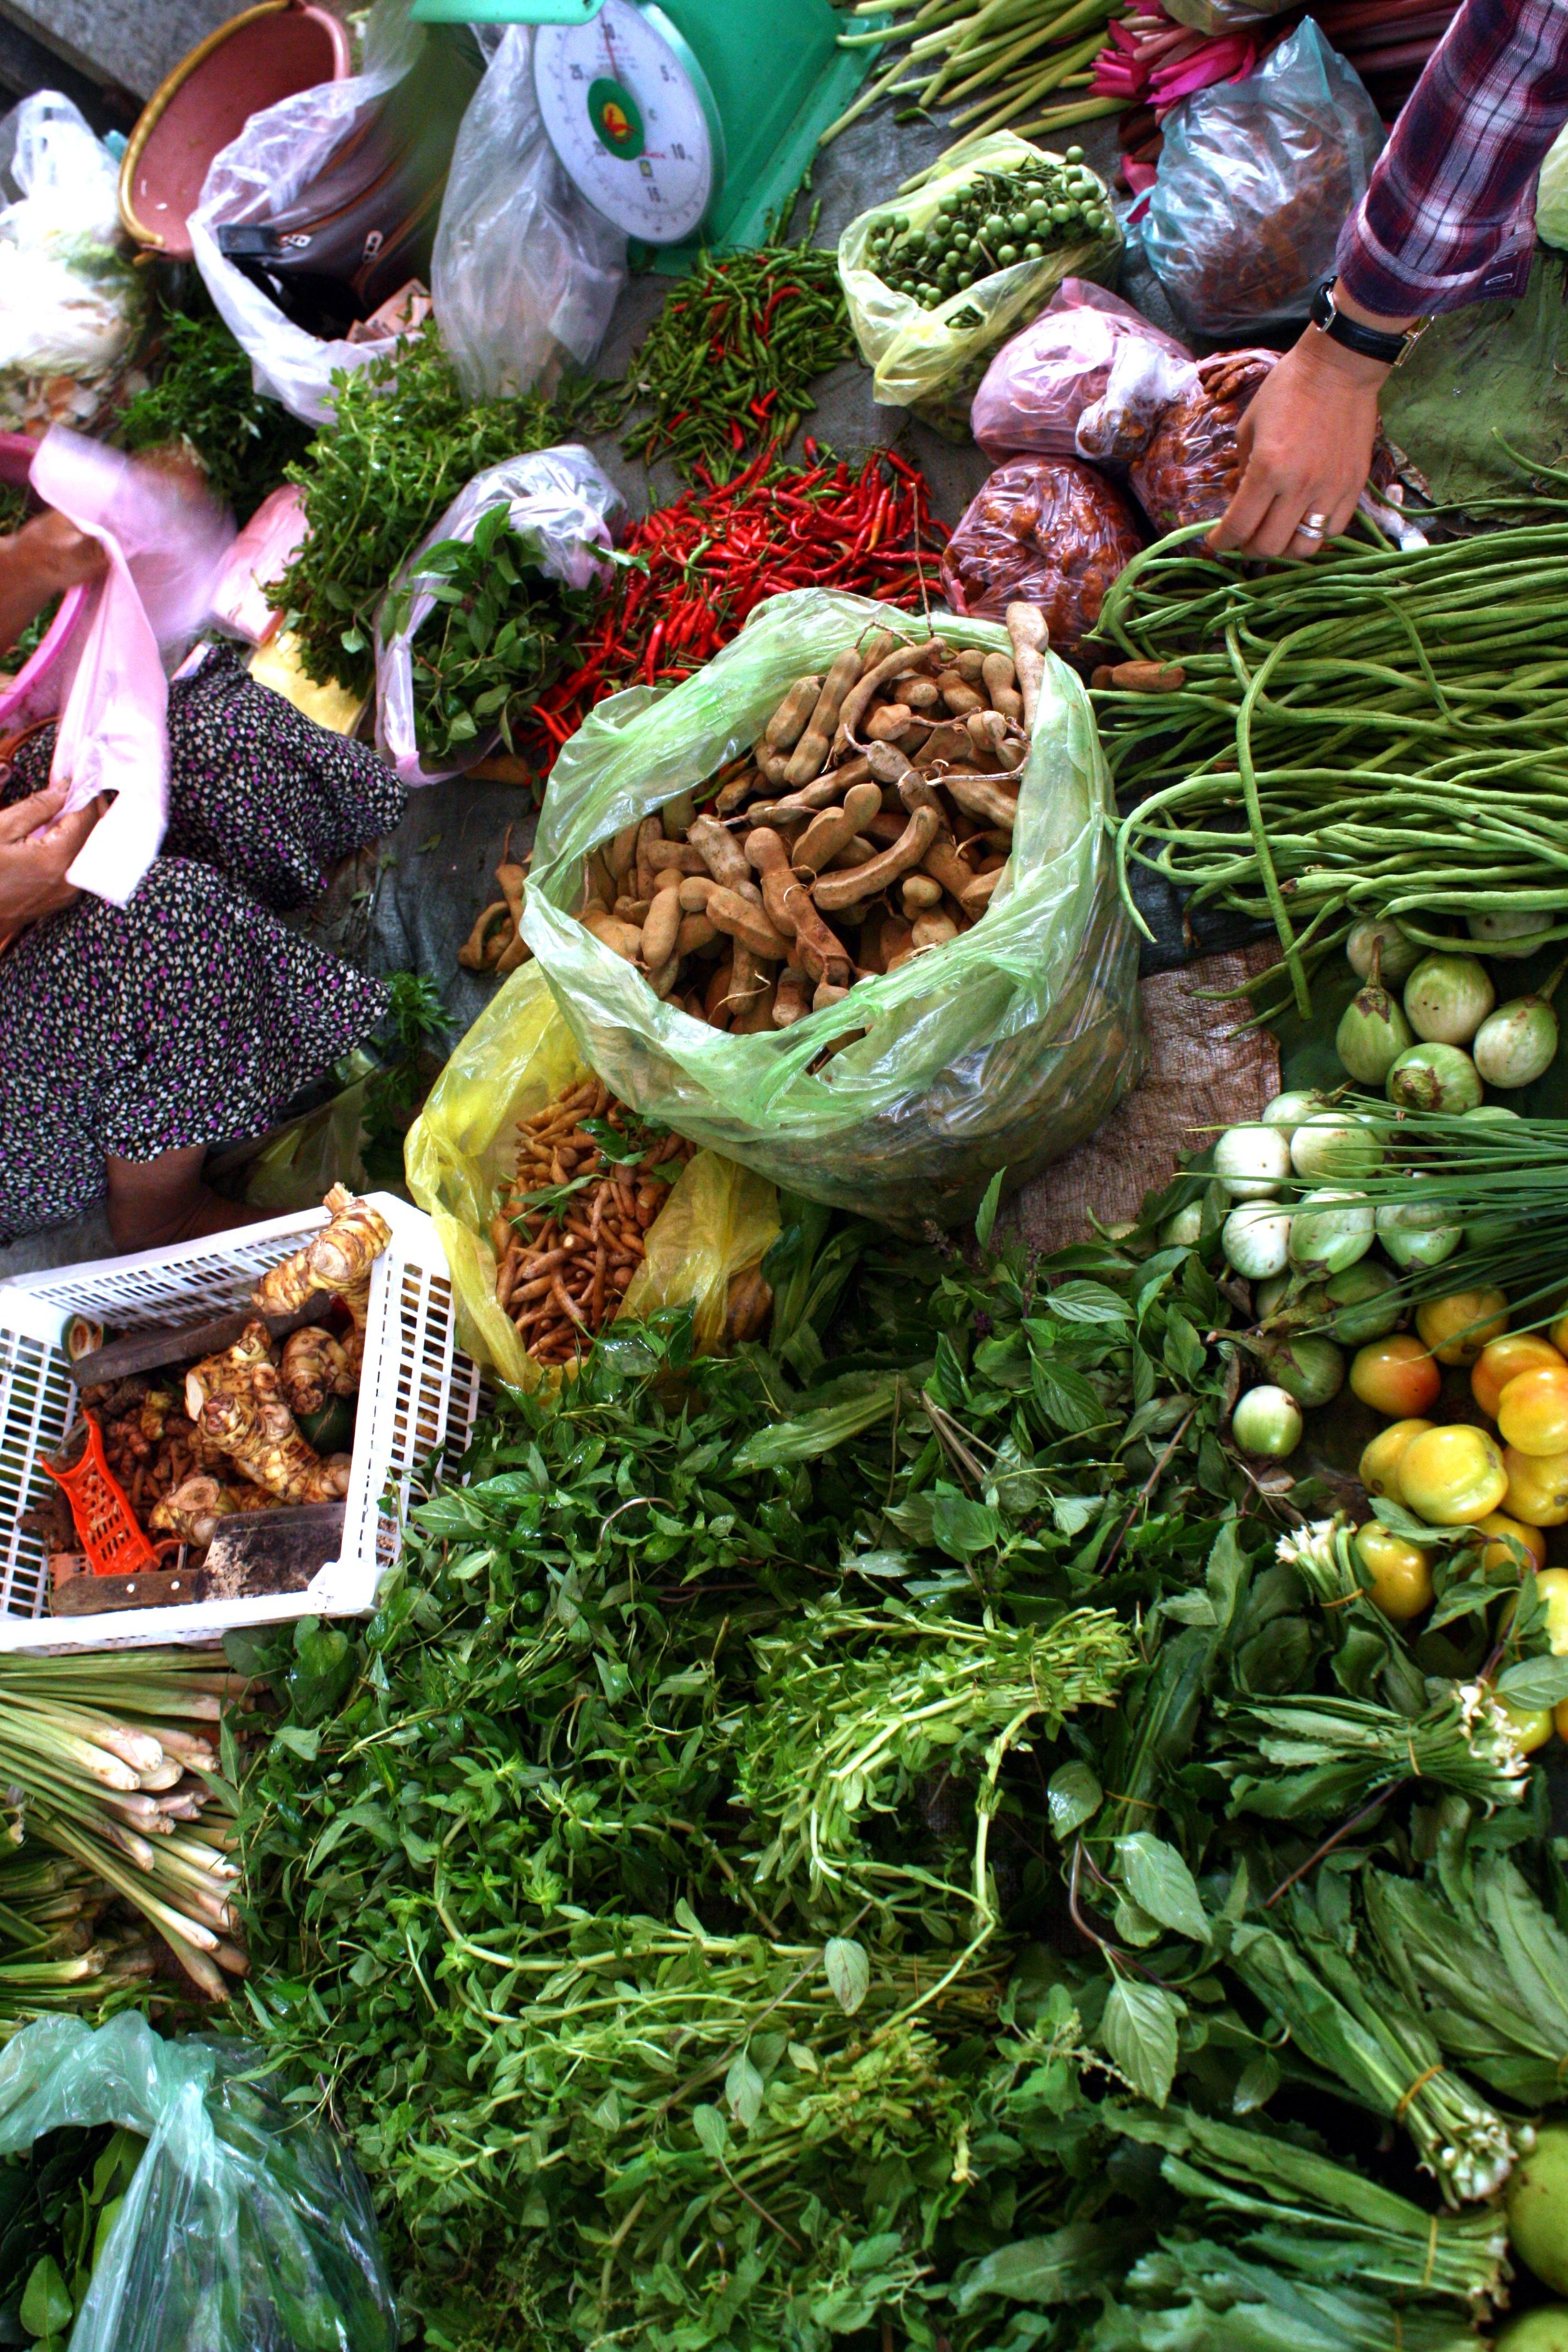 Cambodian markets are so colourful.